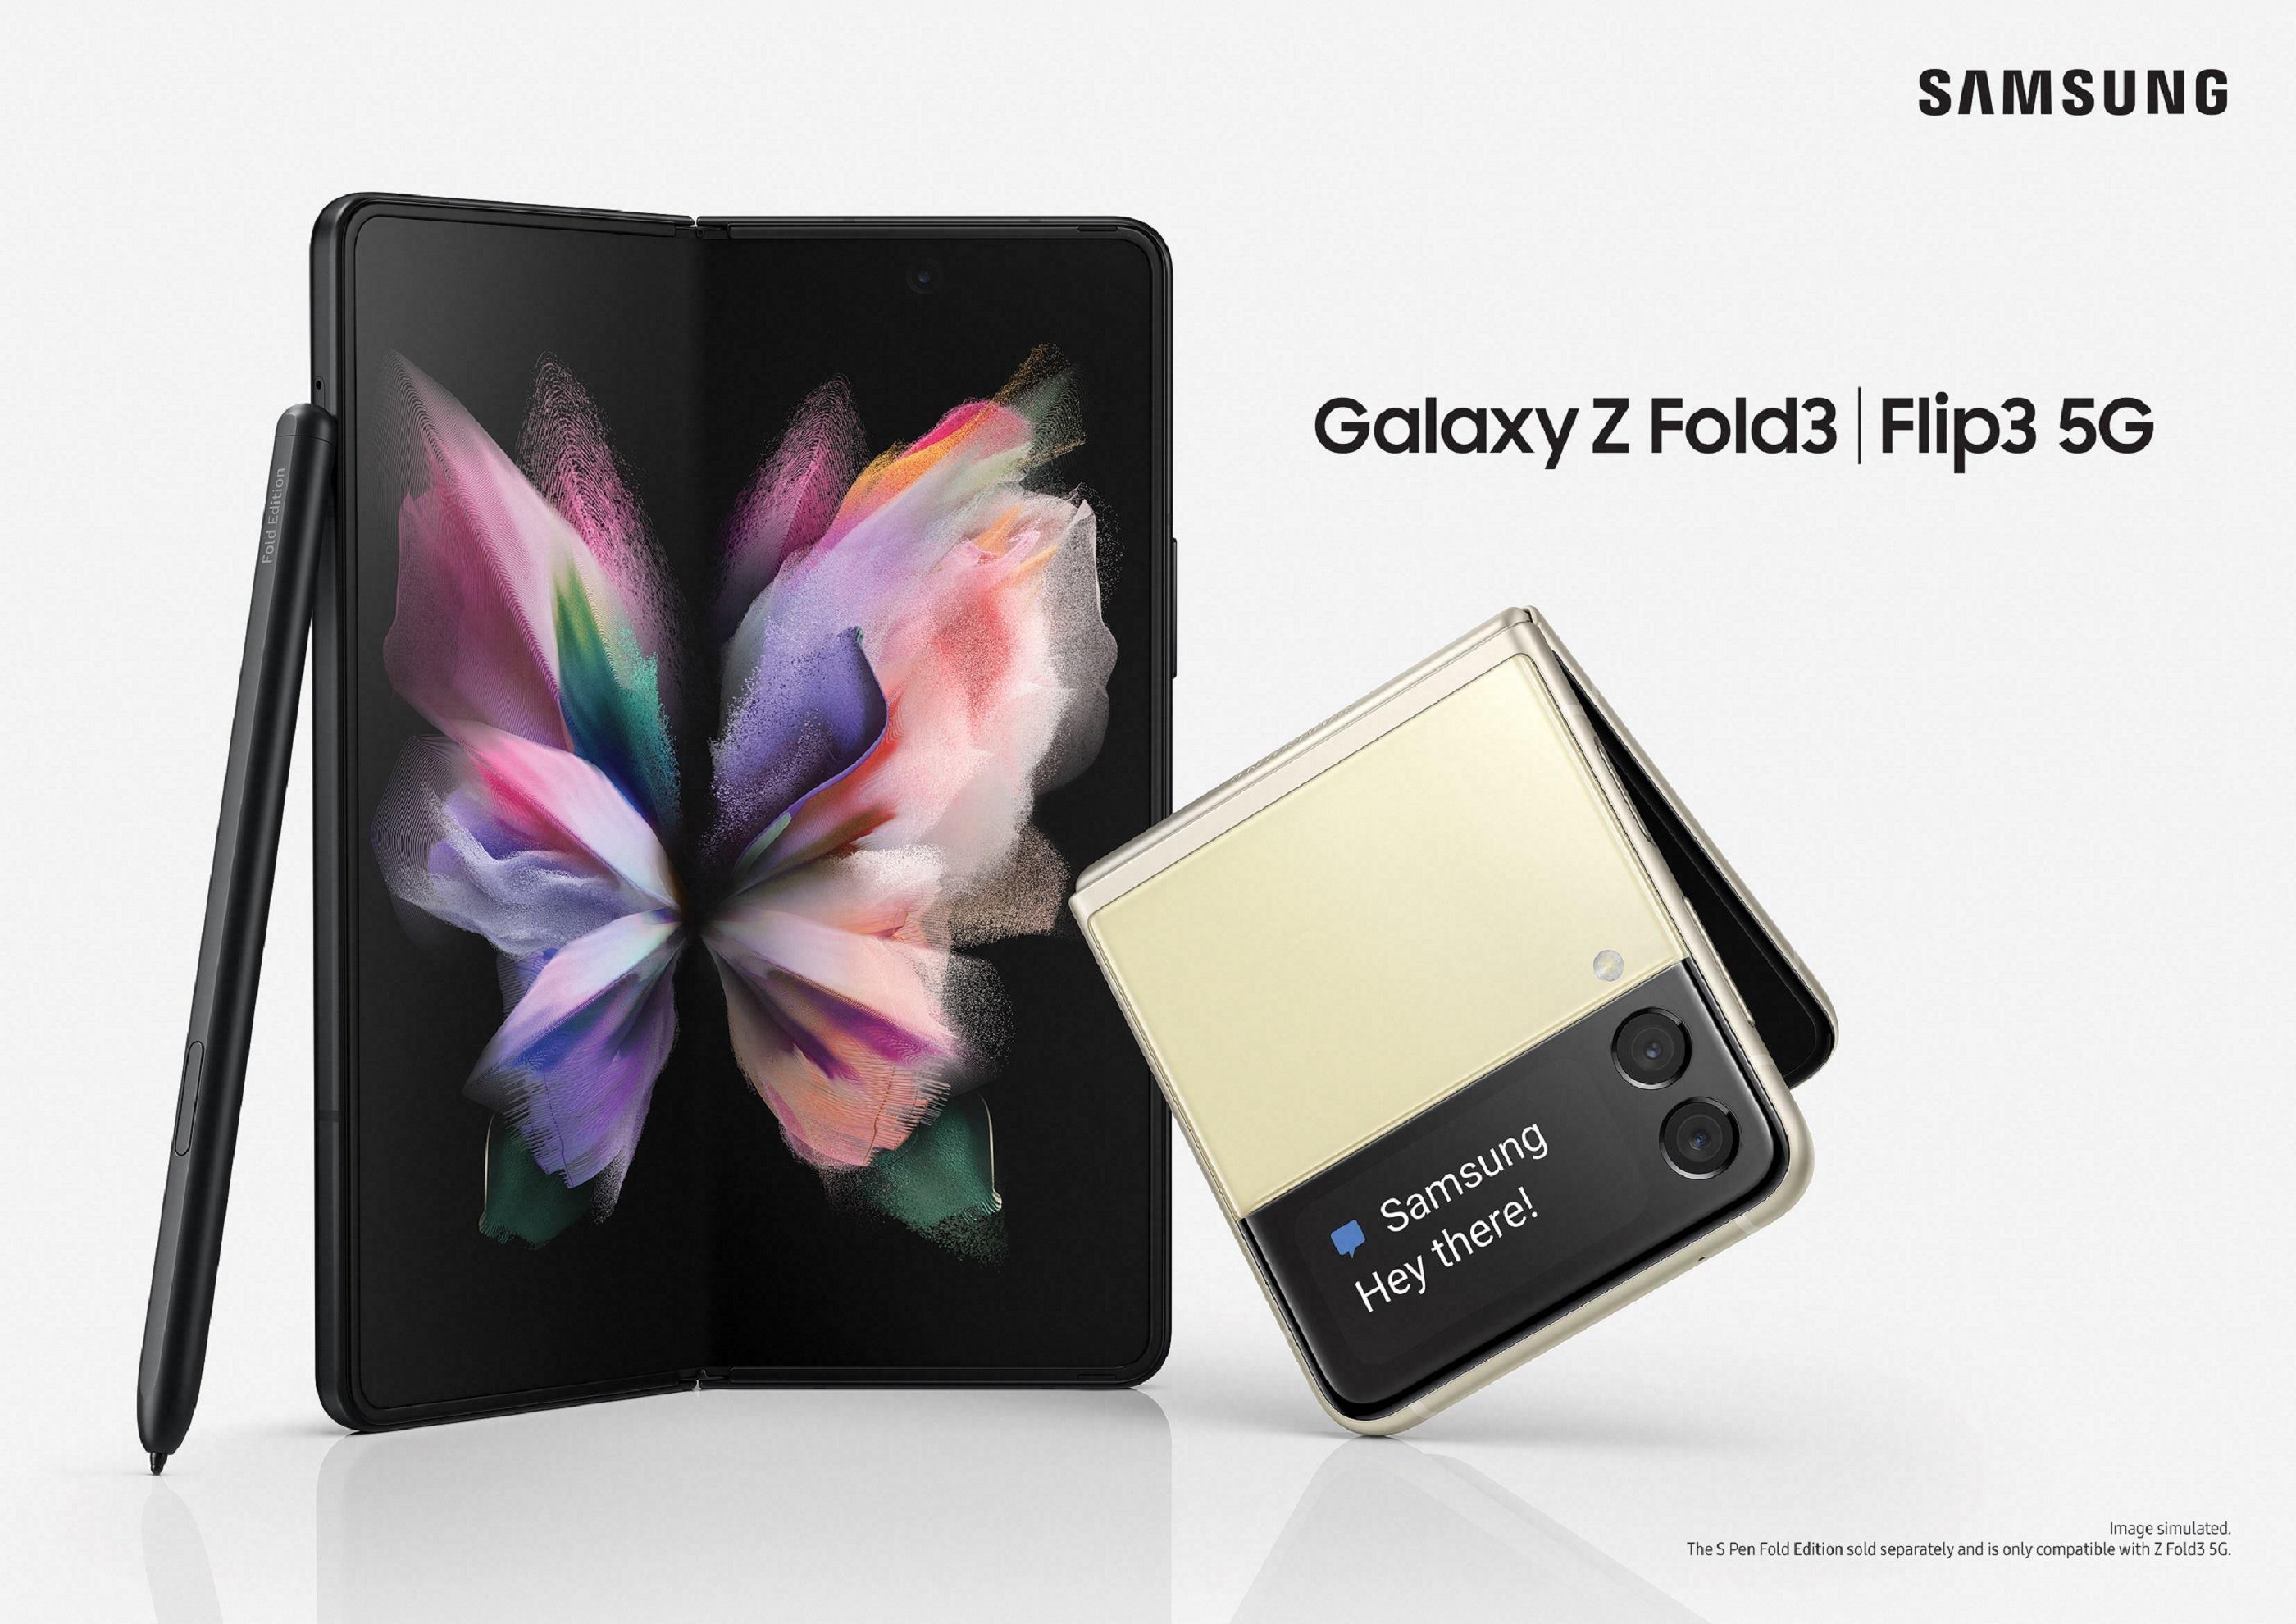 Samsung เปิดตัว Galaxy Z Fold3 5G | Flip3 สมาร์ทโฟนหน้าจอพับได้เจเนอเรชันที่ 3